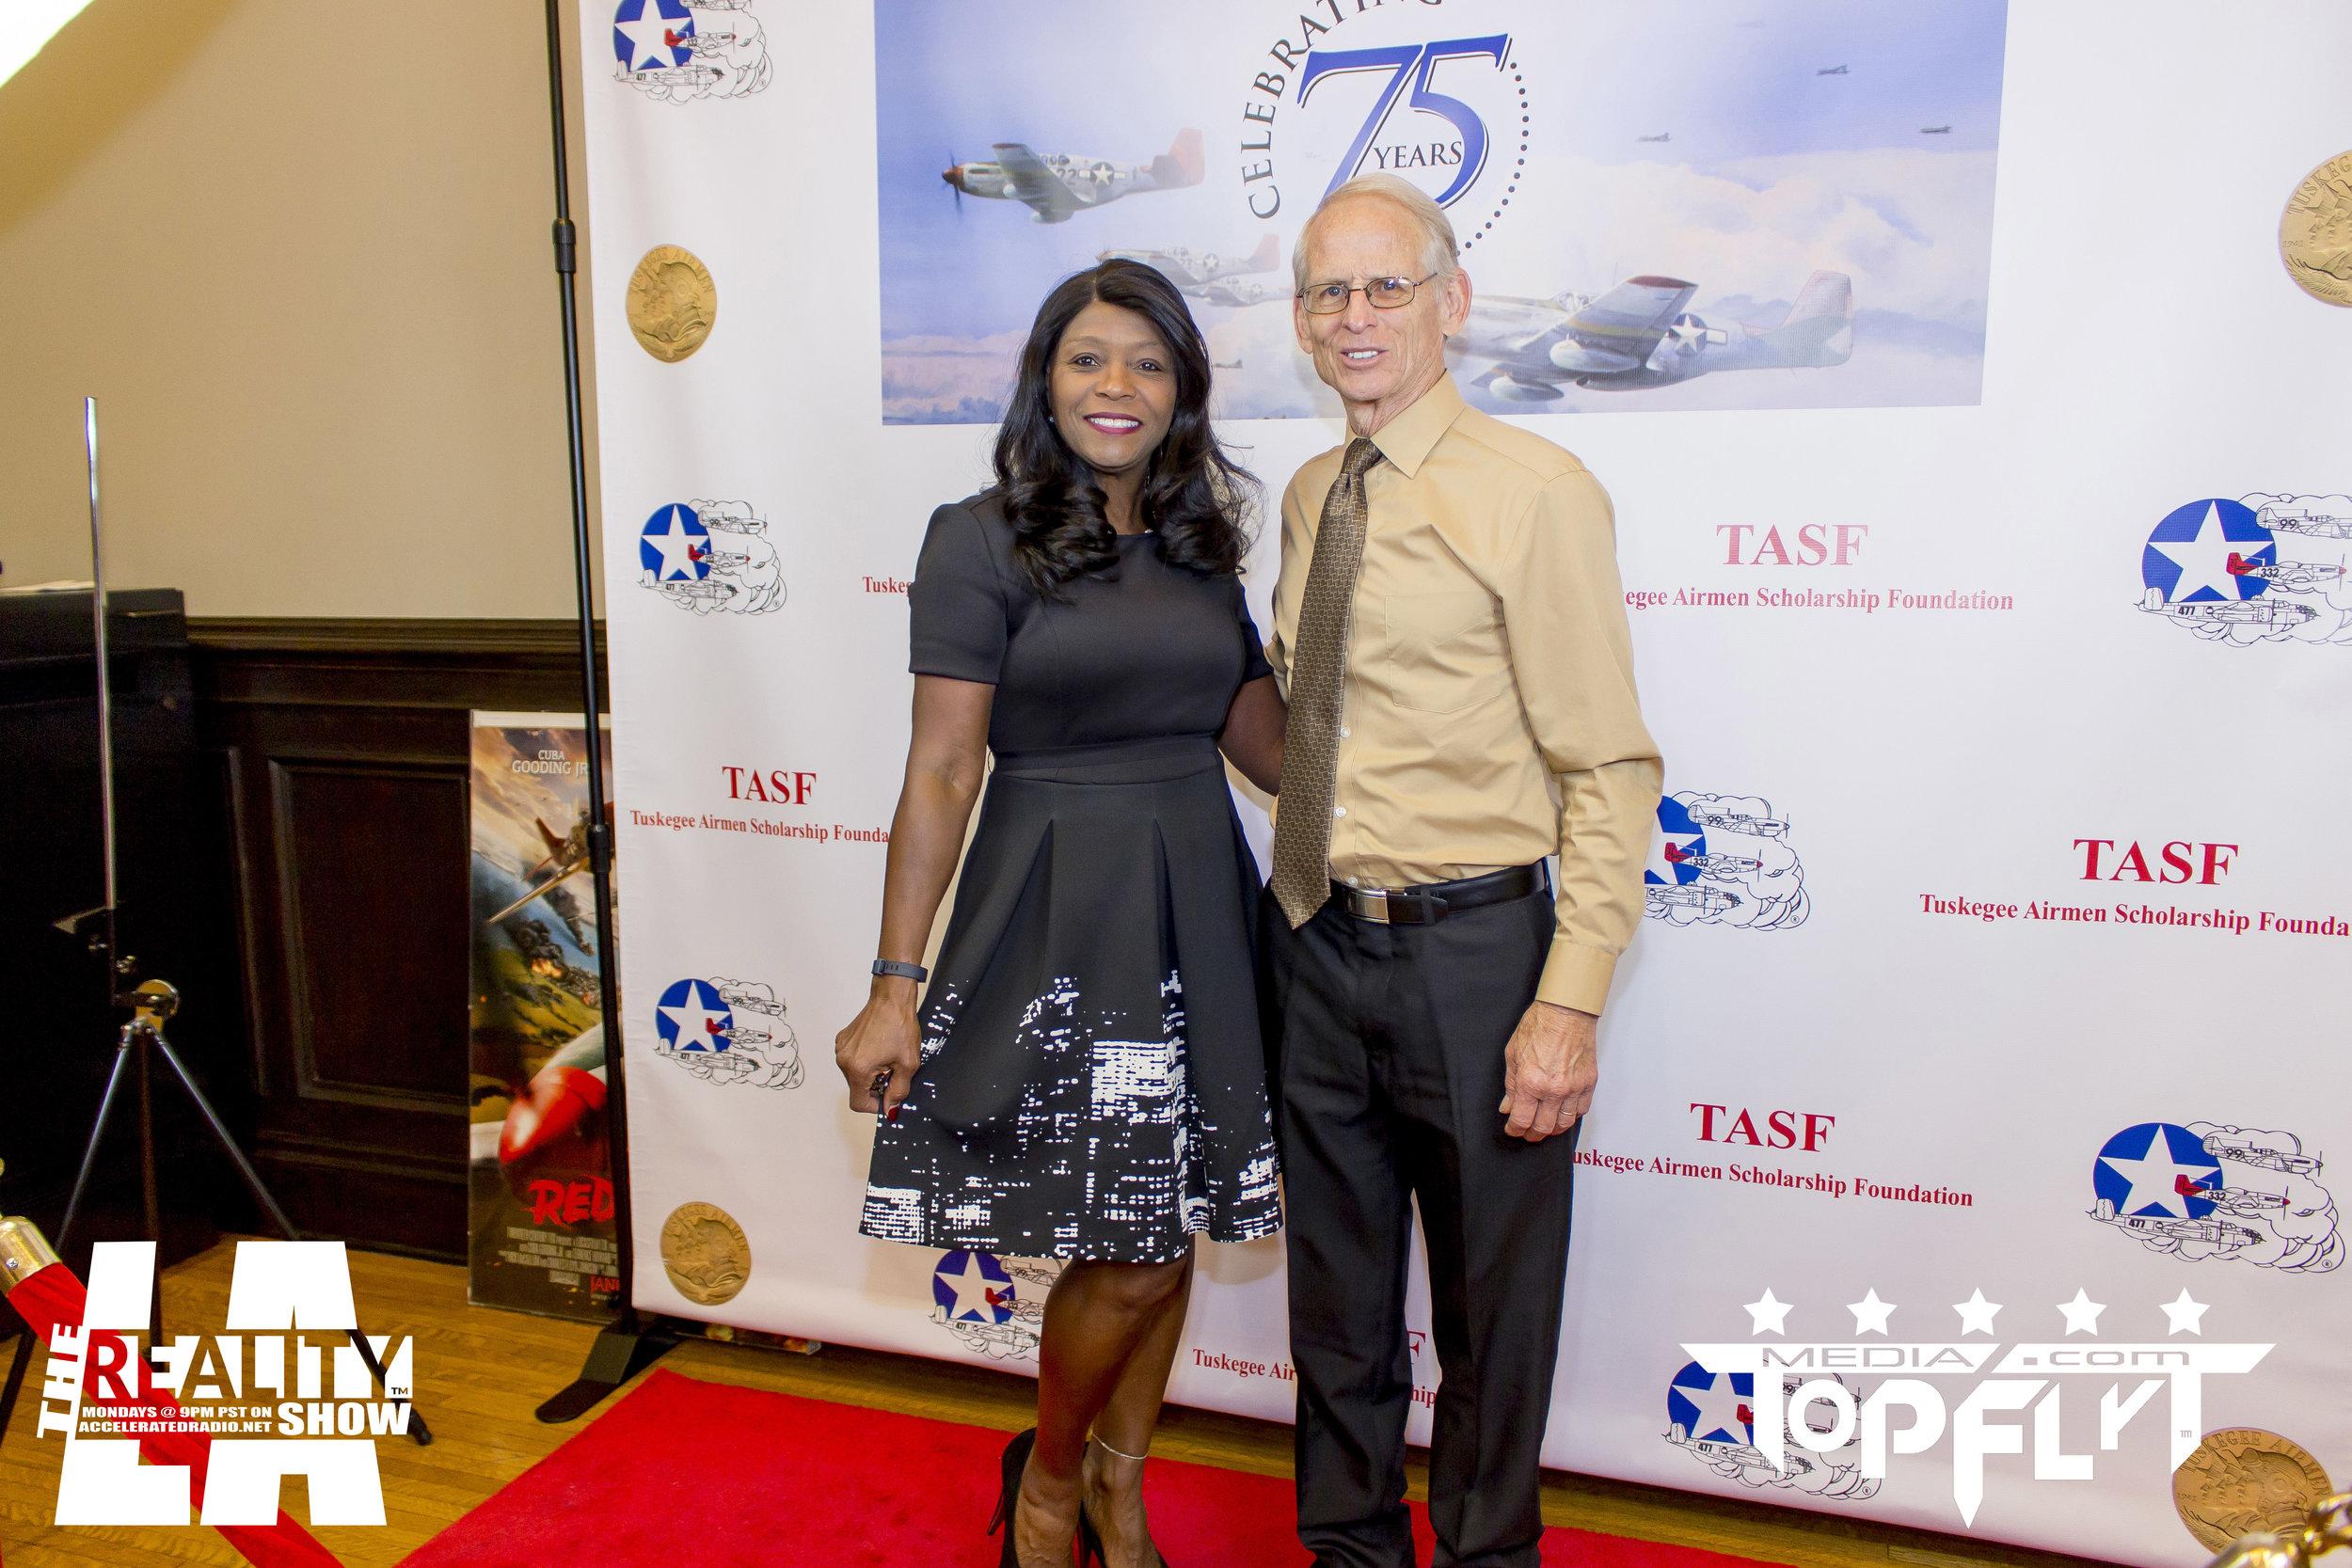 The Reality Show LA - Tuskegee Airmen 75th Anniversary VIP Reception_56.jpg